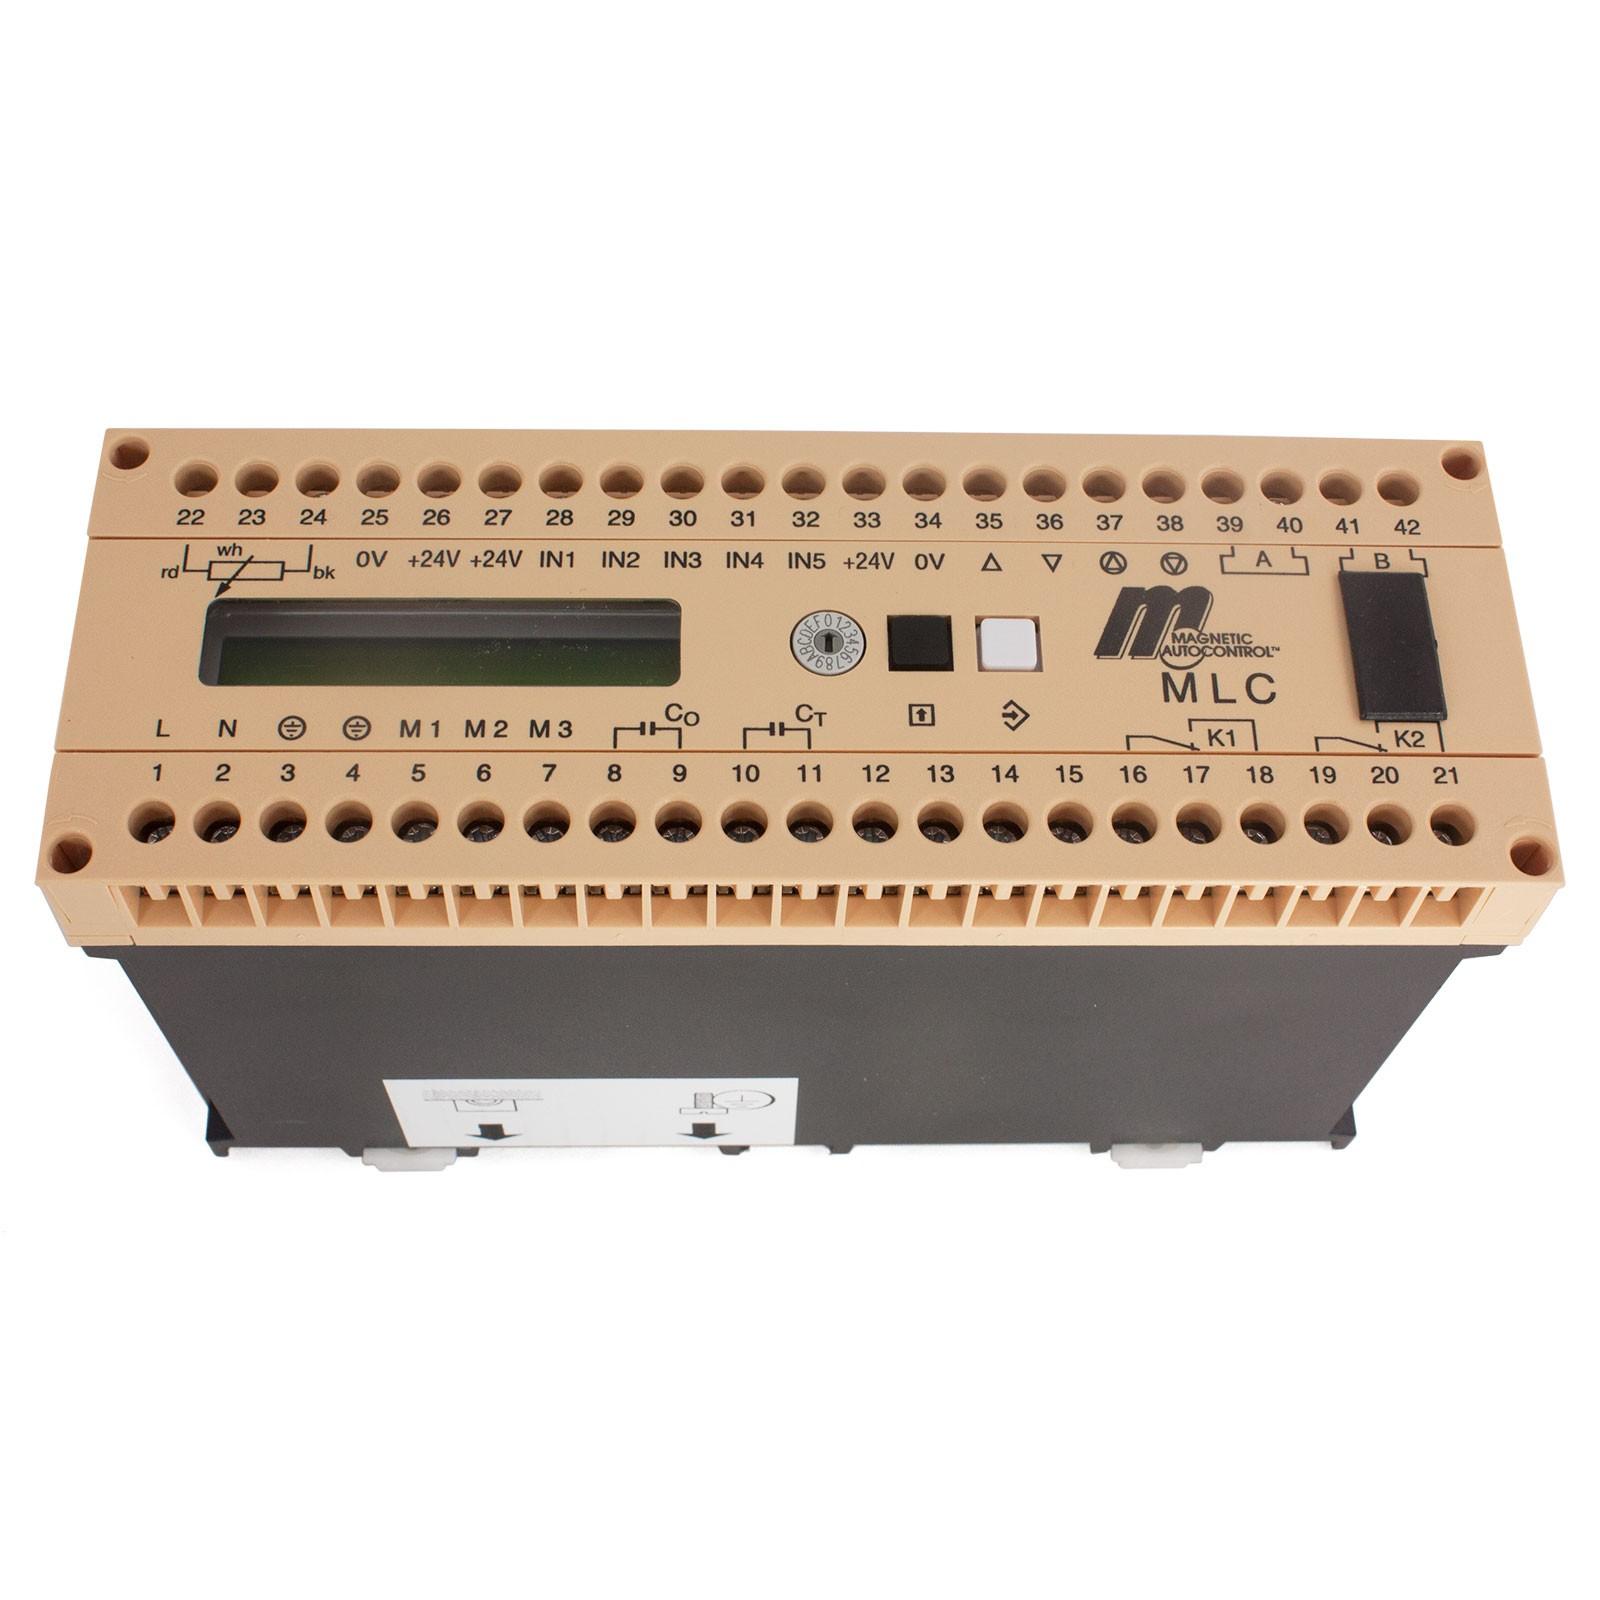 Magnetic Autocontrol For Mib Mlc Magnetic Lane